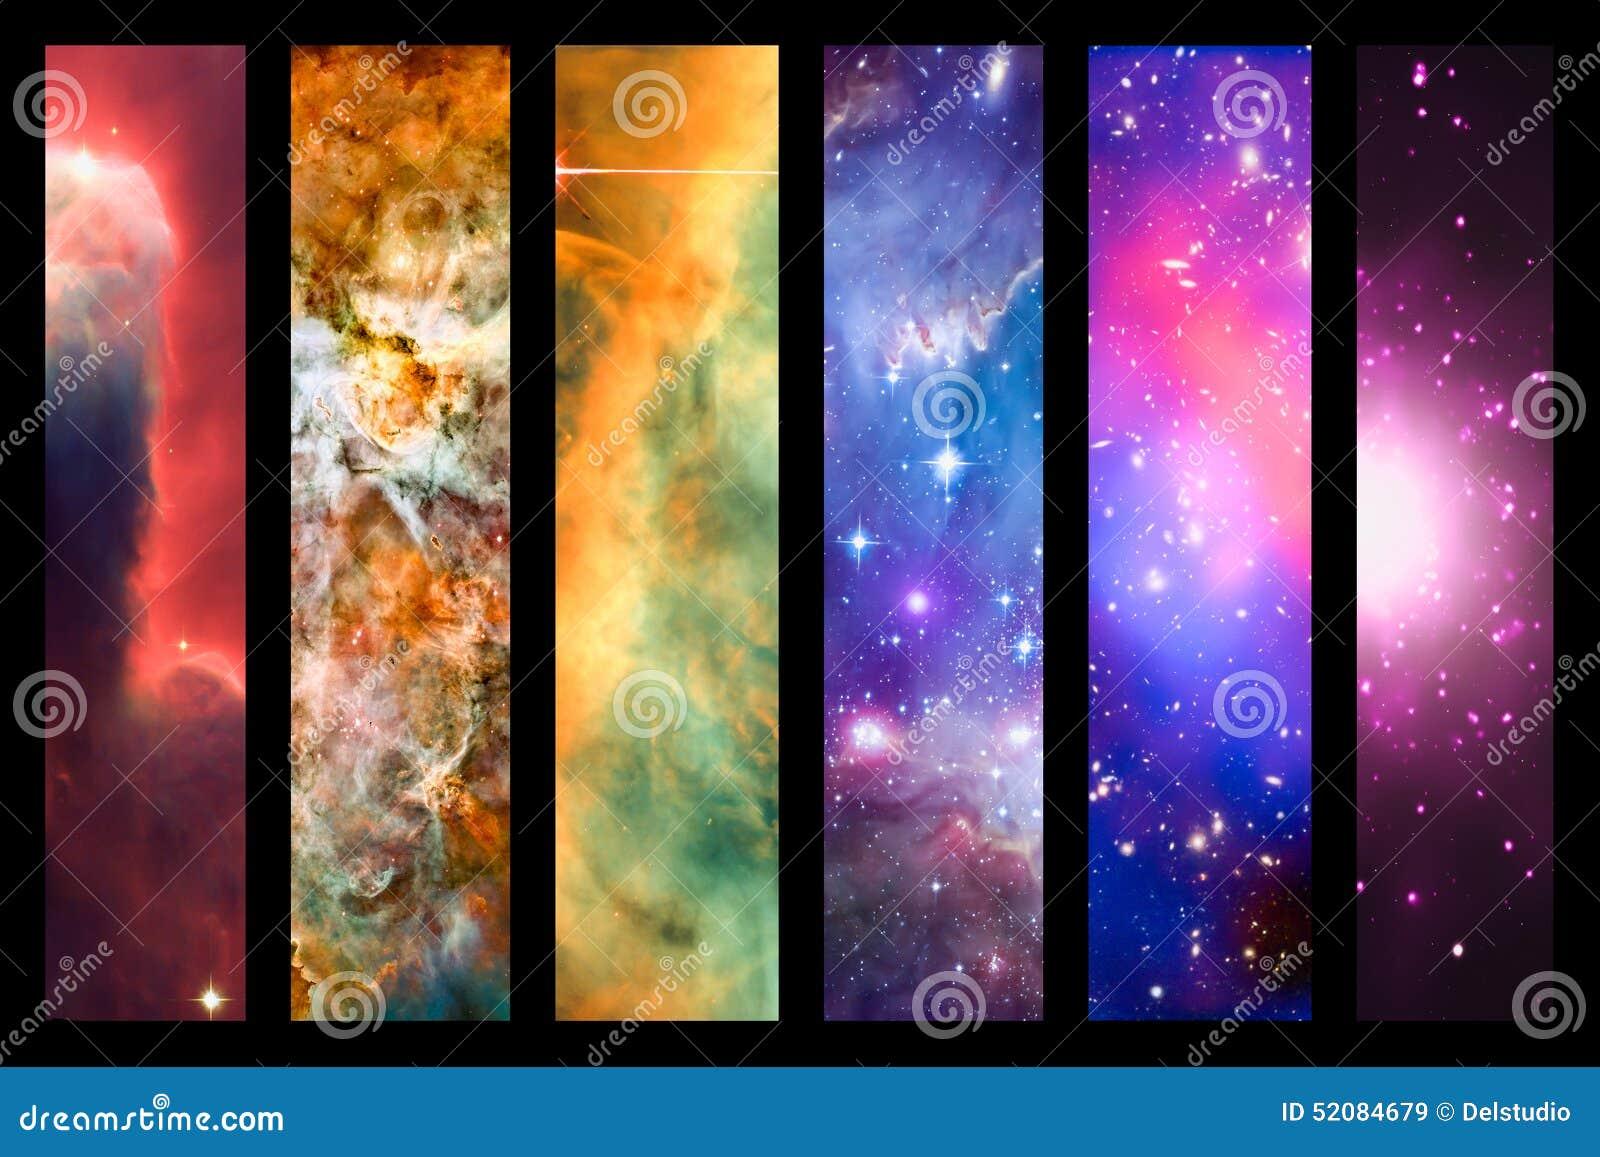 Space nebula and galaxy rainbow collage